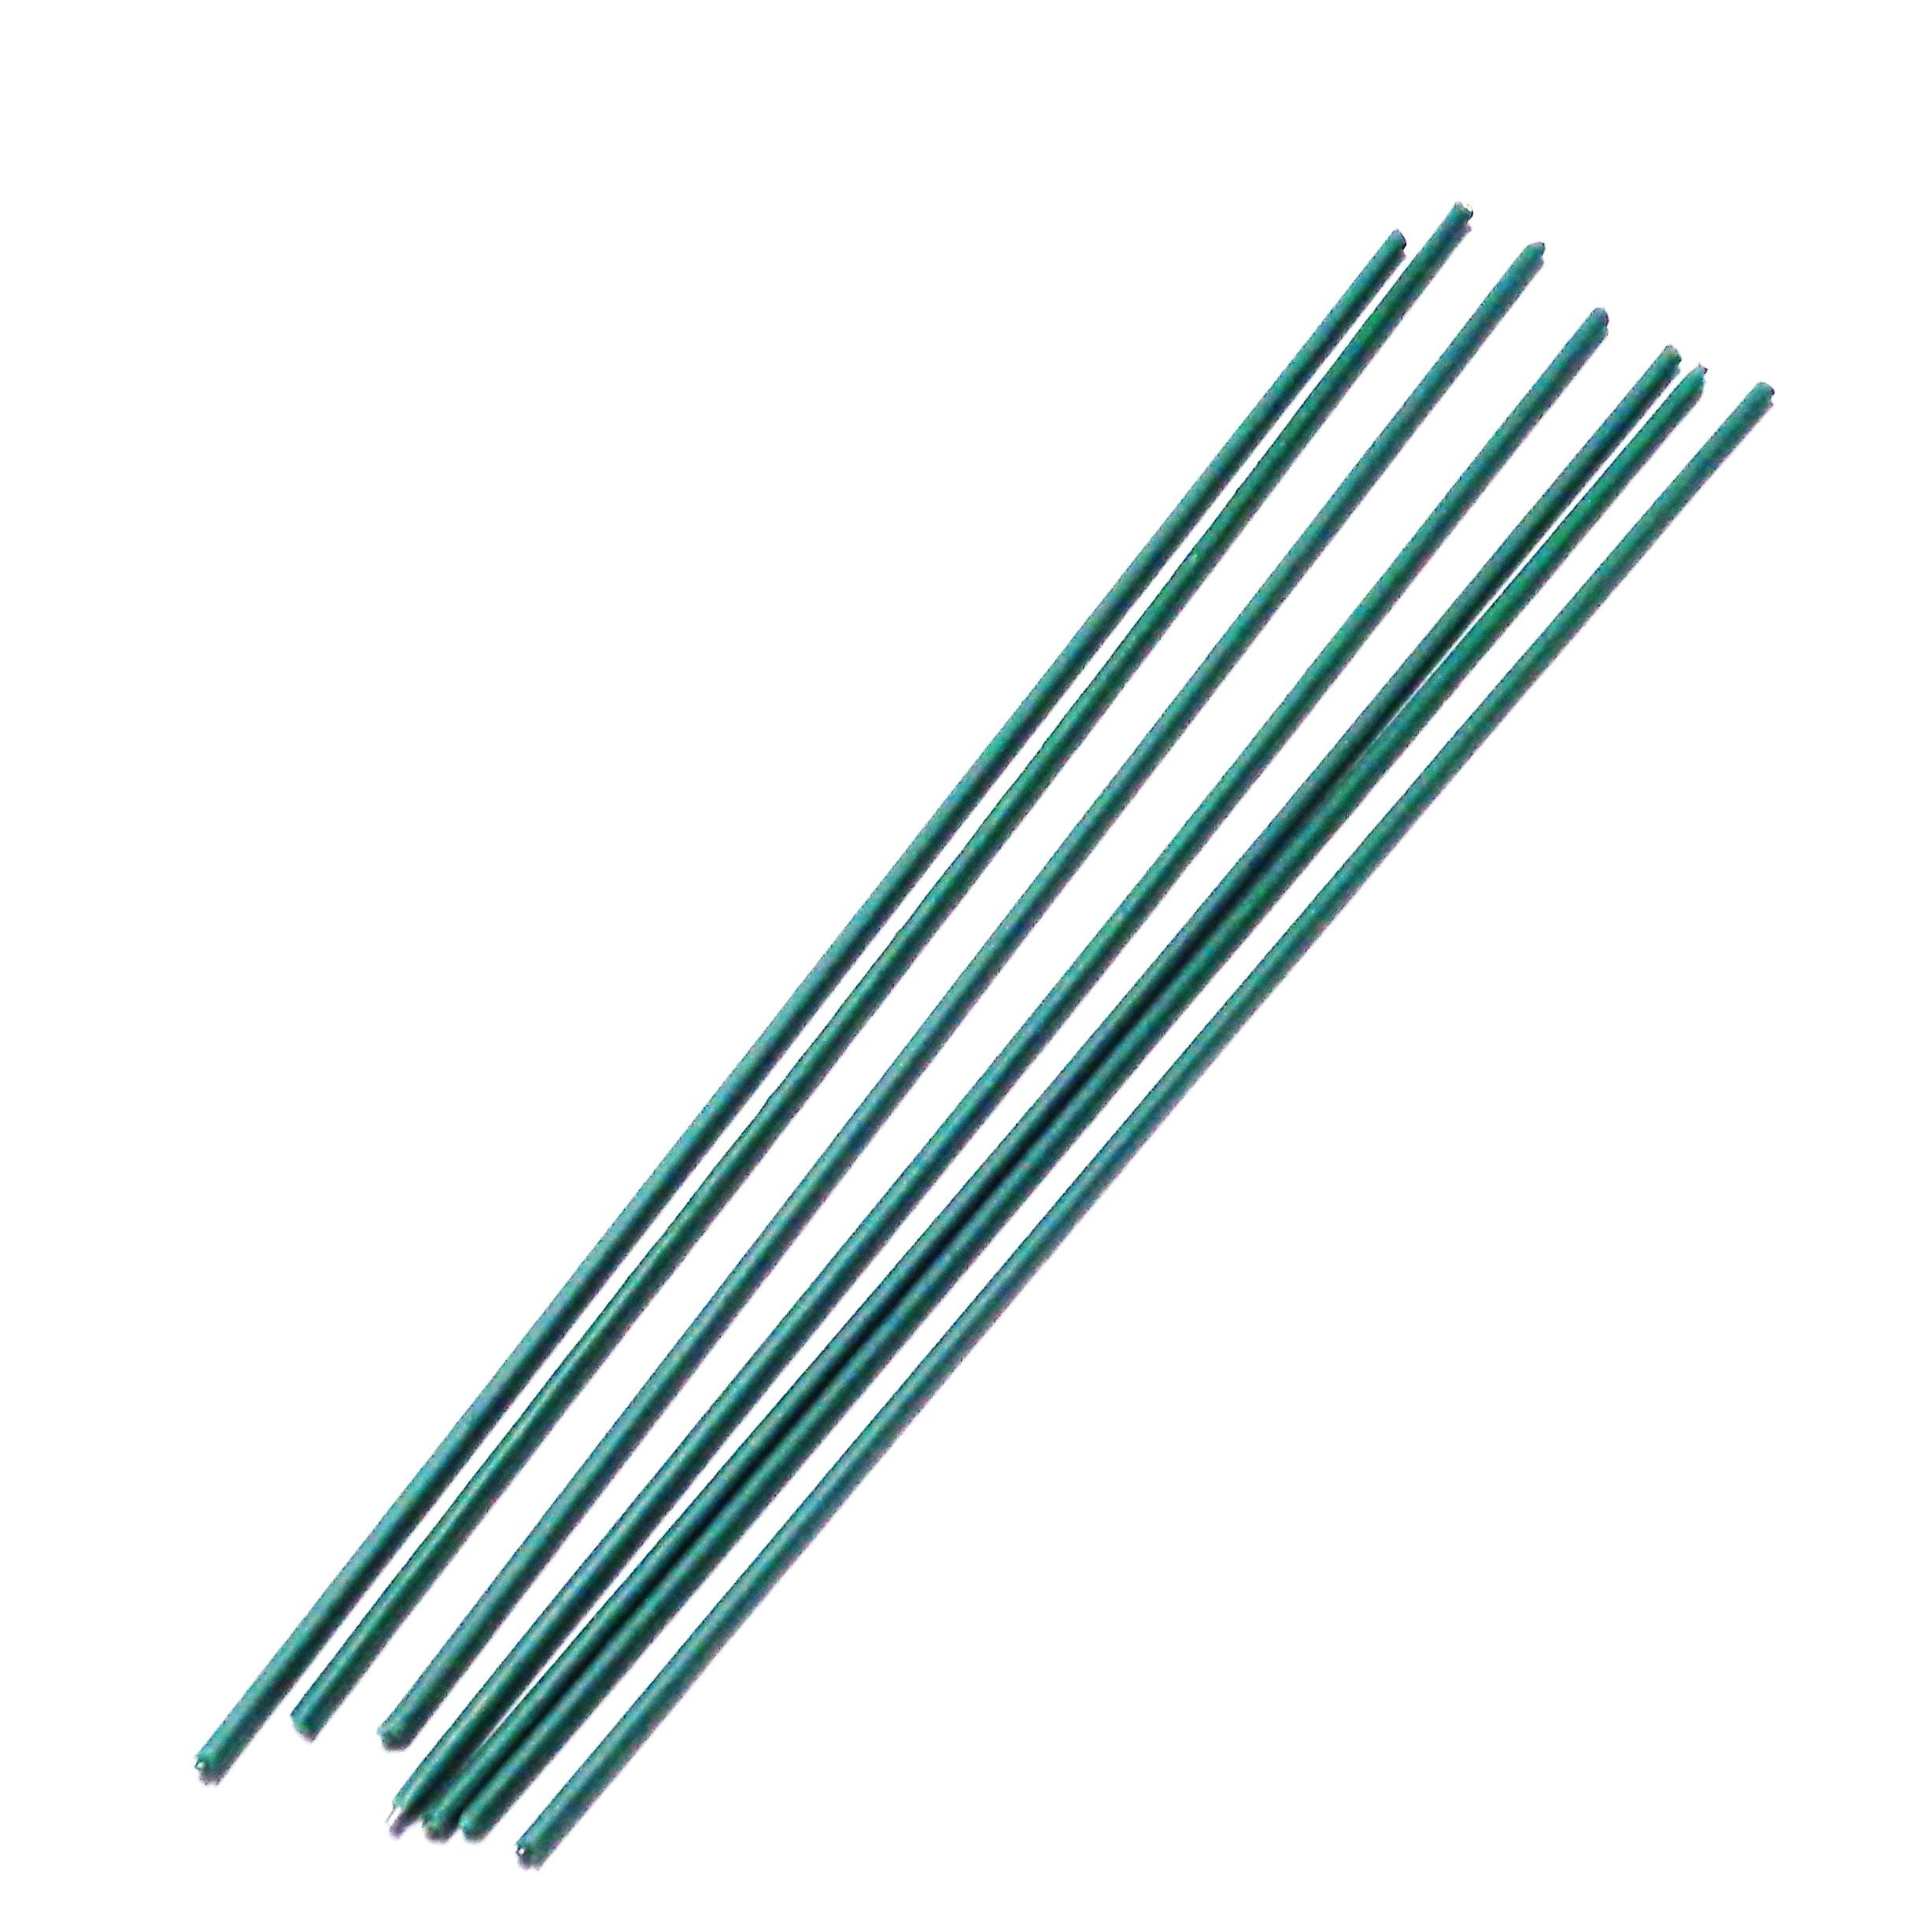 Sarma flori in nylon verde-20 cm 1 buc